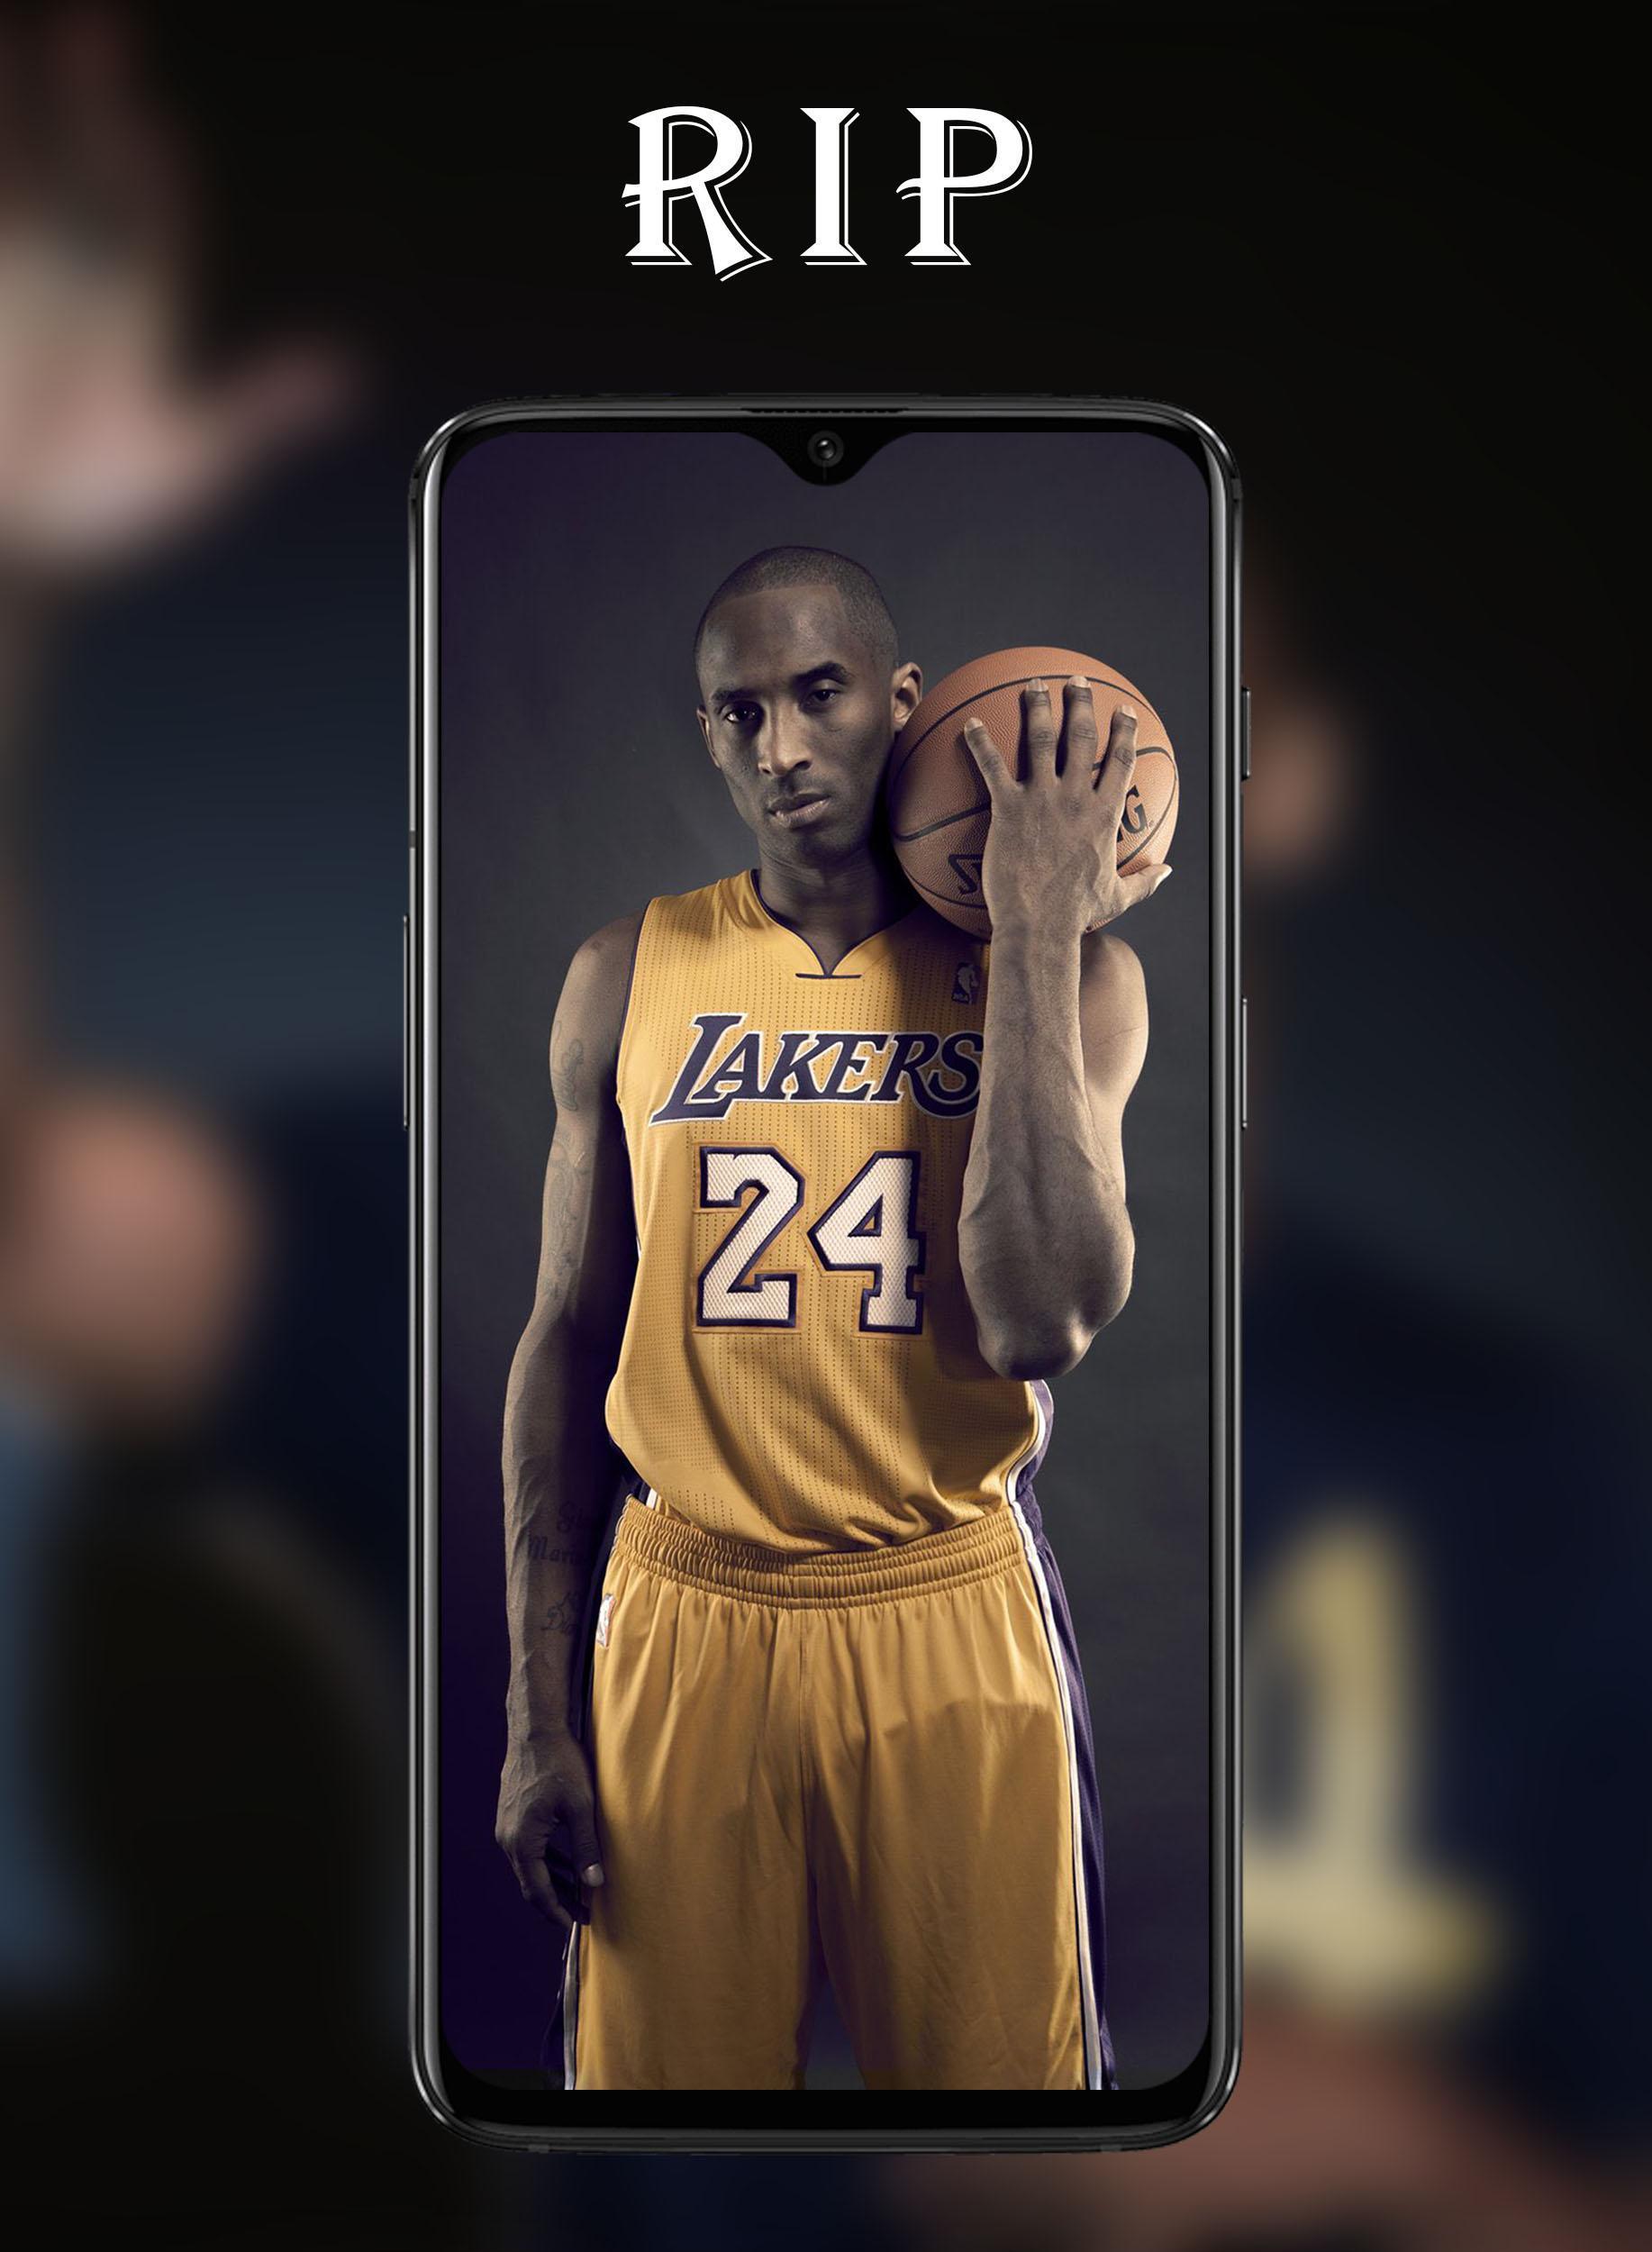 RIP Kobe Bryant 4k wallpaper for Android   APK Download 1834x2500